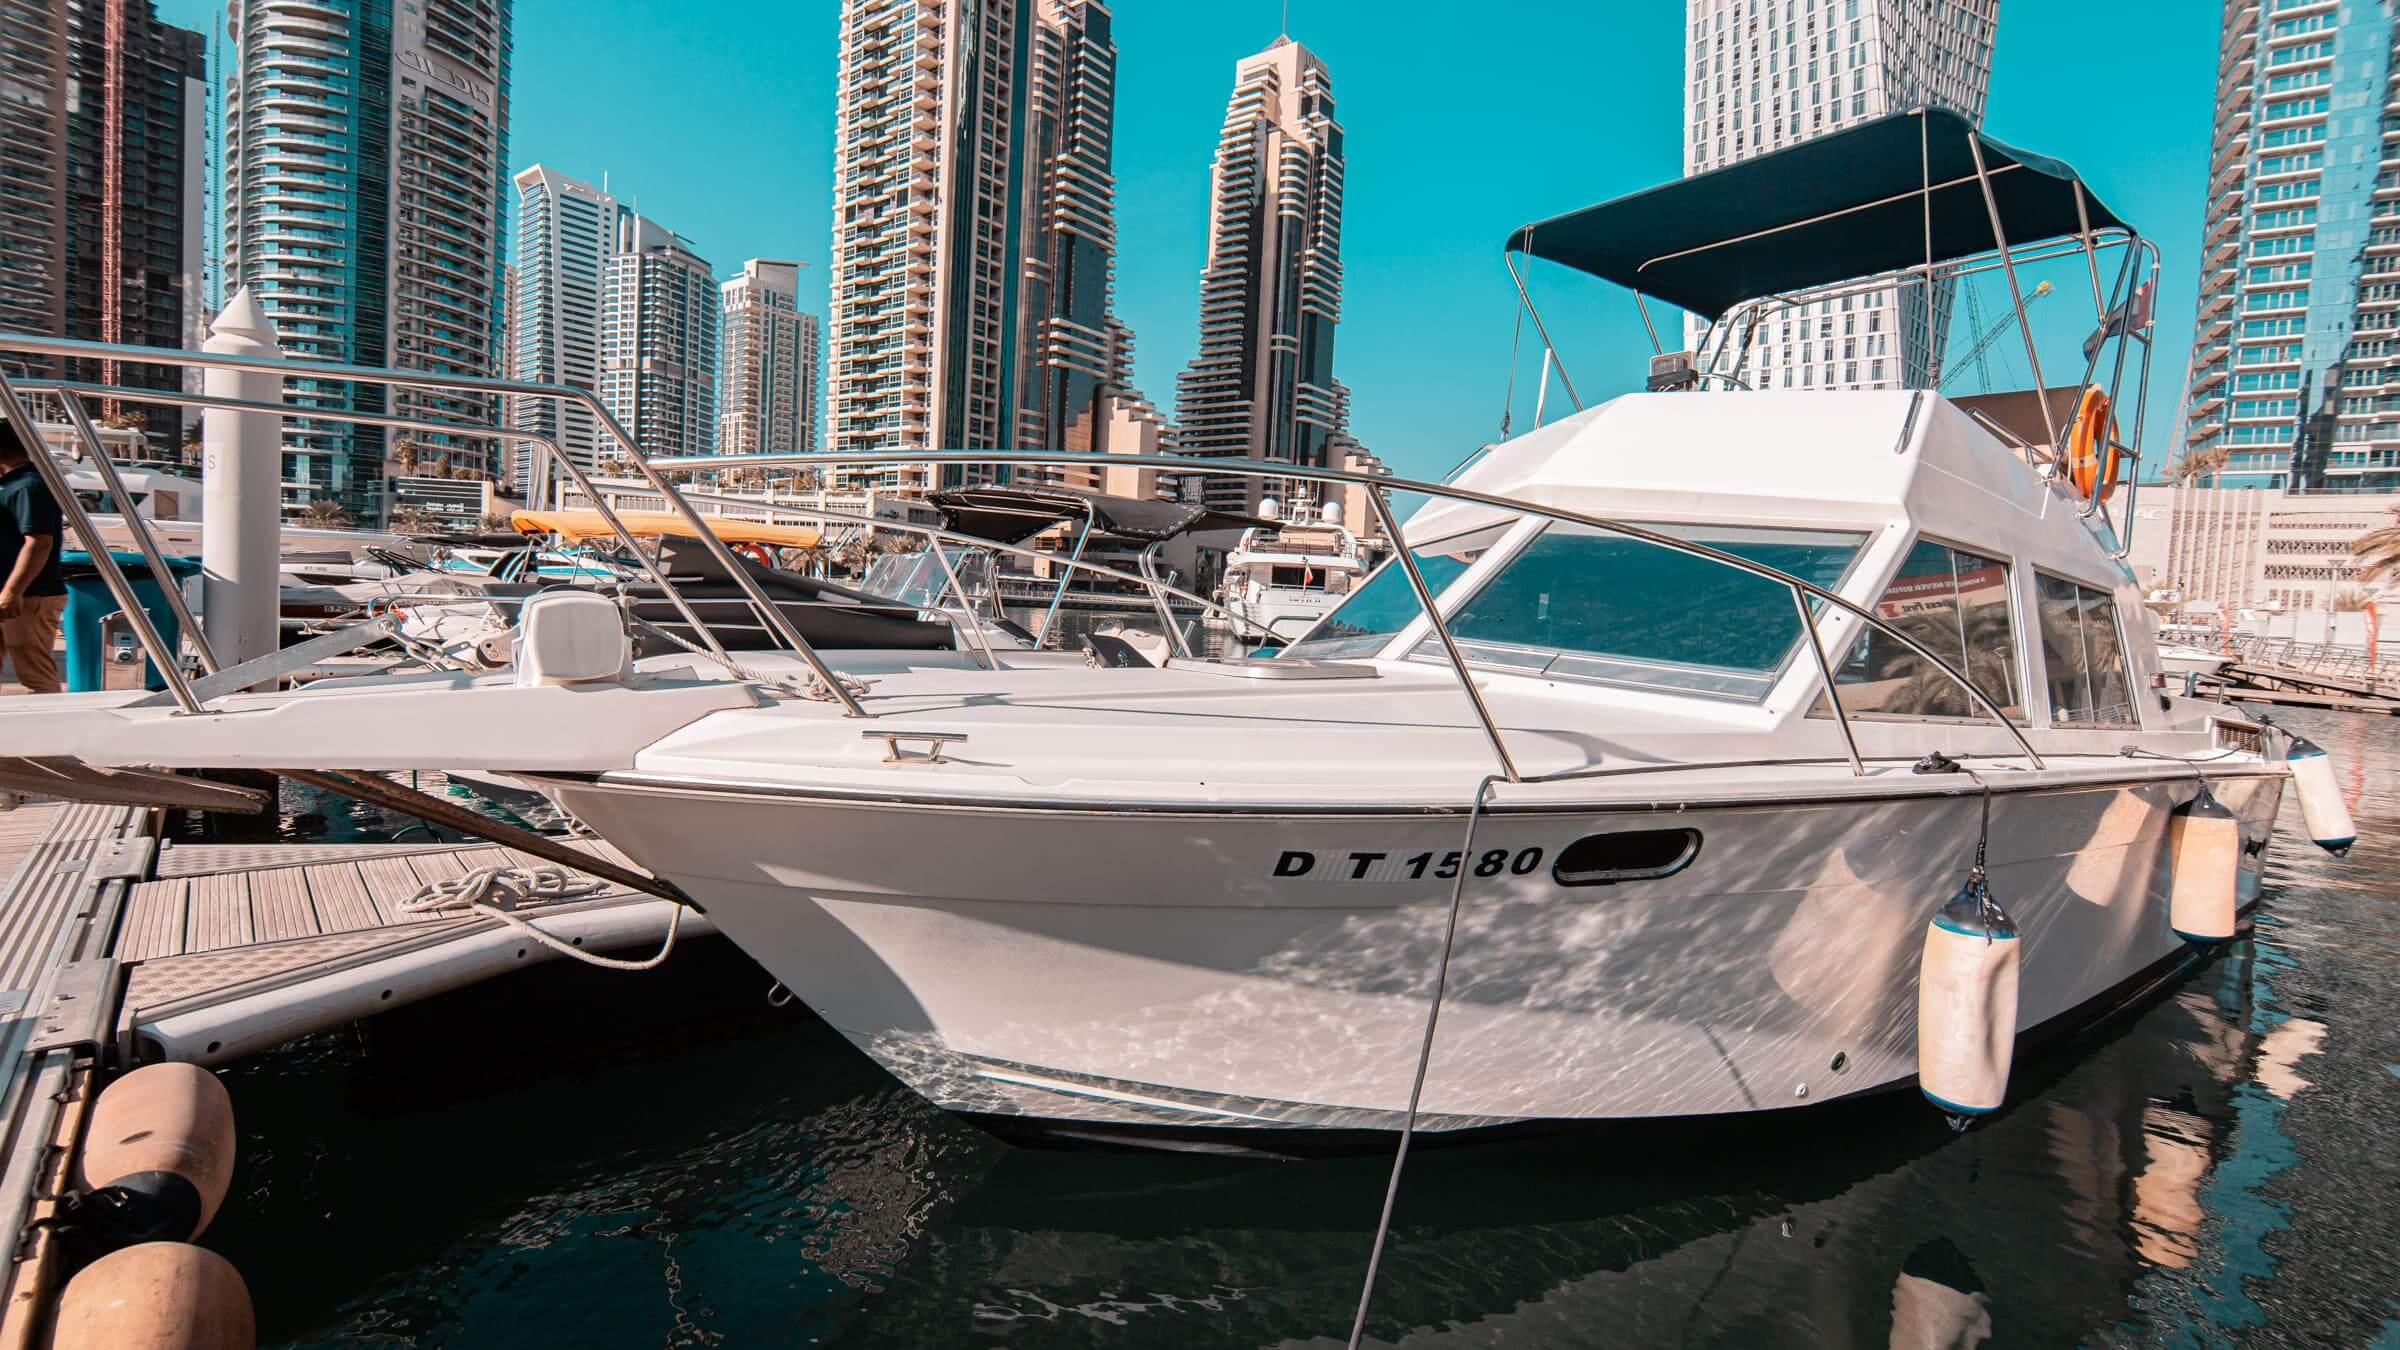 fiesta emiratos barco yate